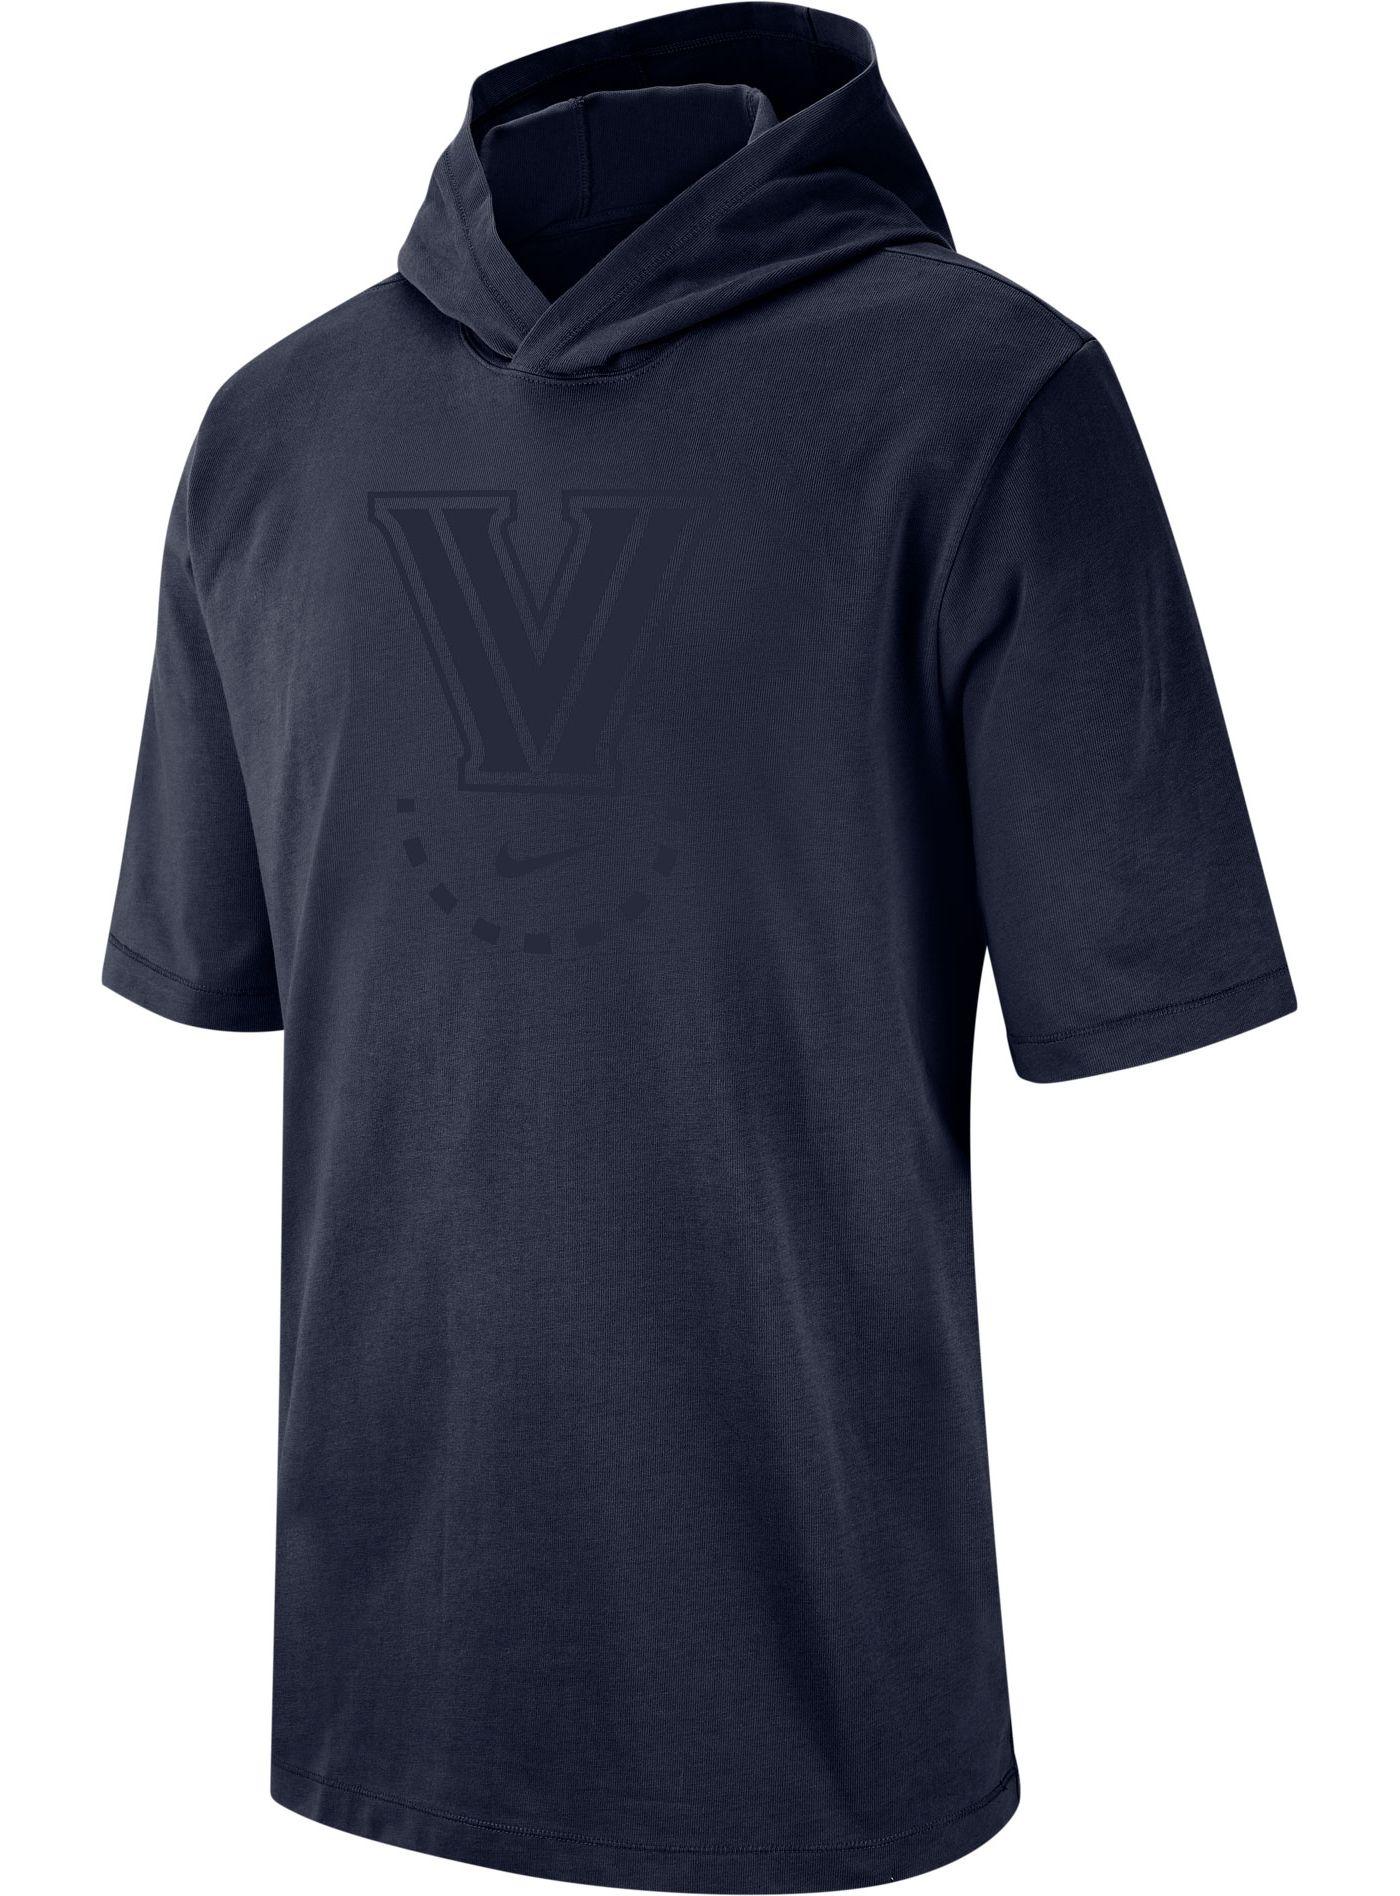 Nike Men's Villanova Wildcats Navy NRG Basketball Short Sleeve Pullover Hooded Shirt